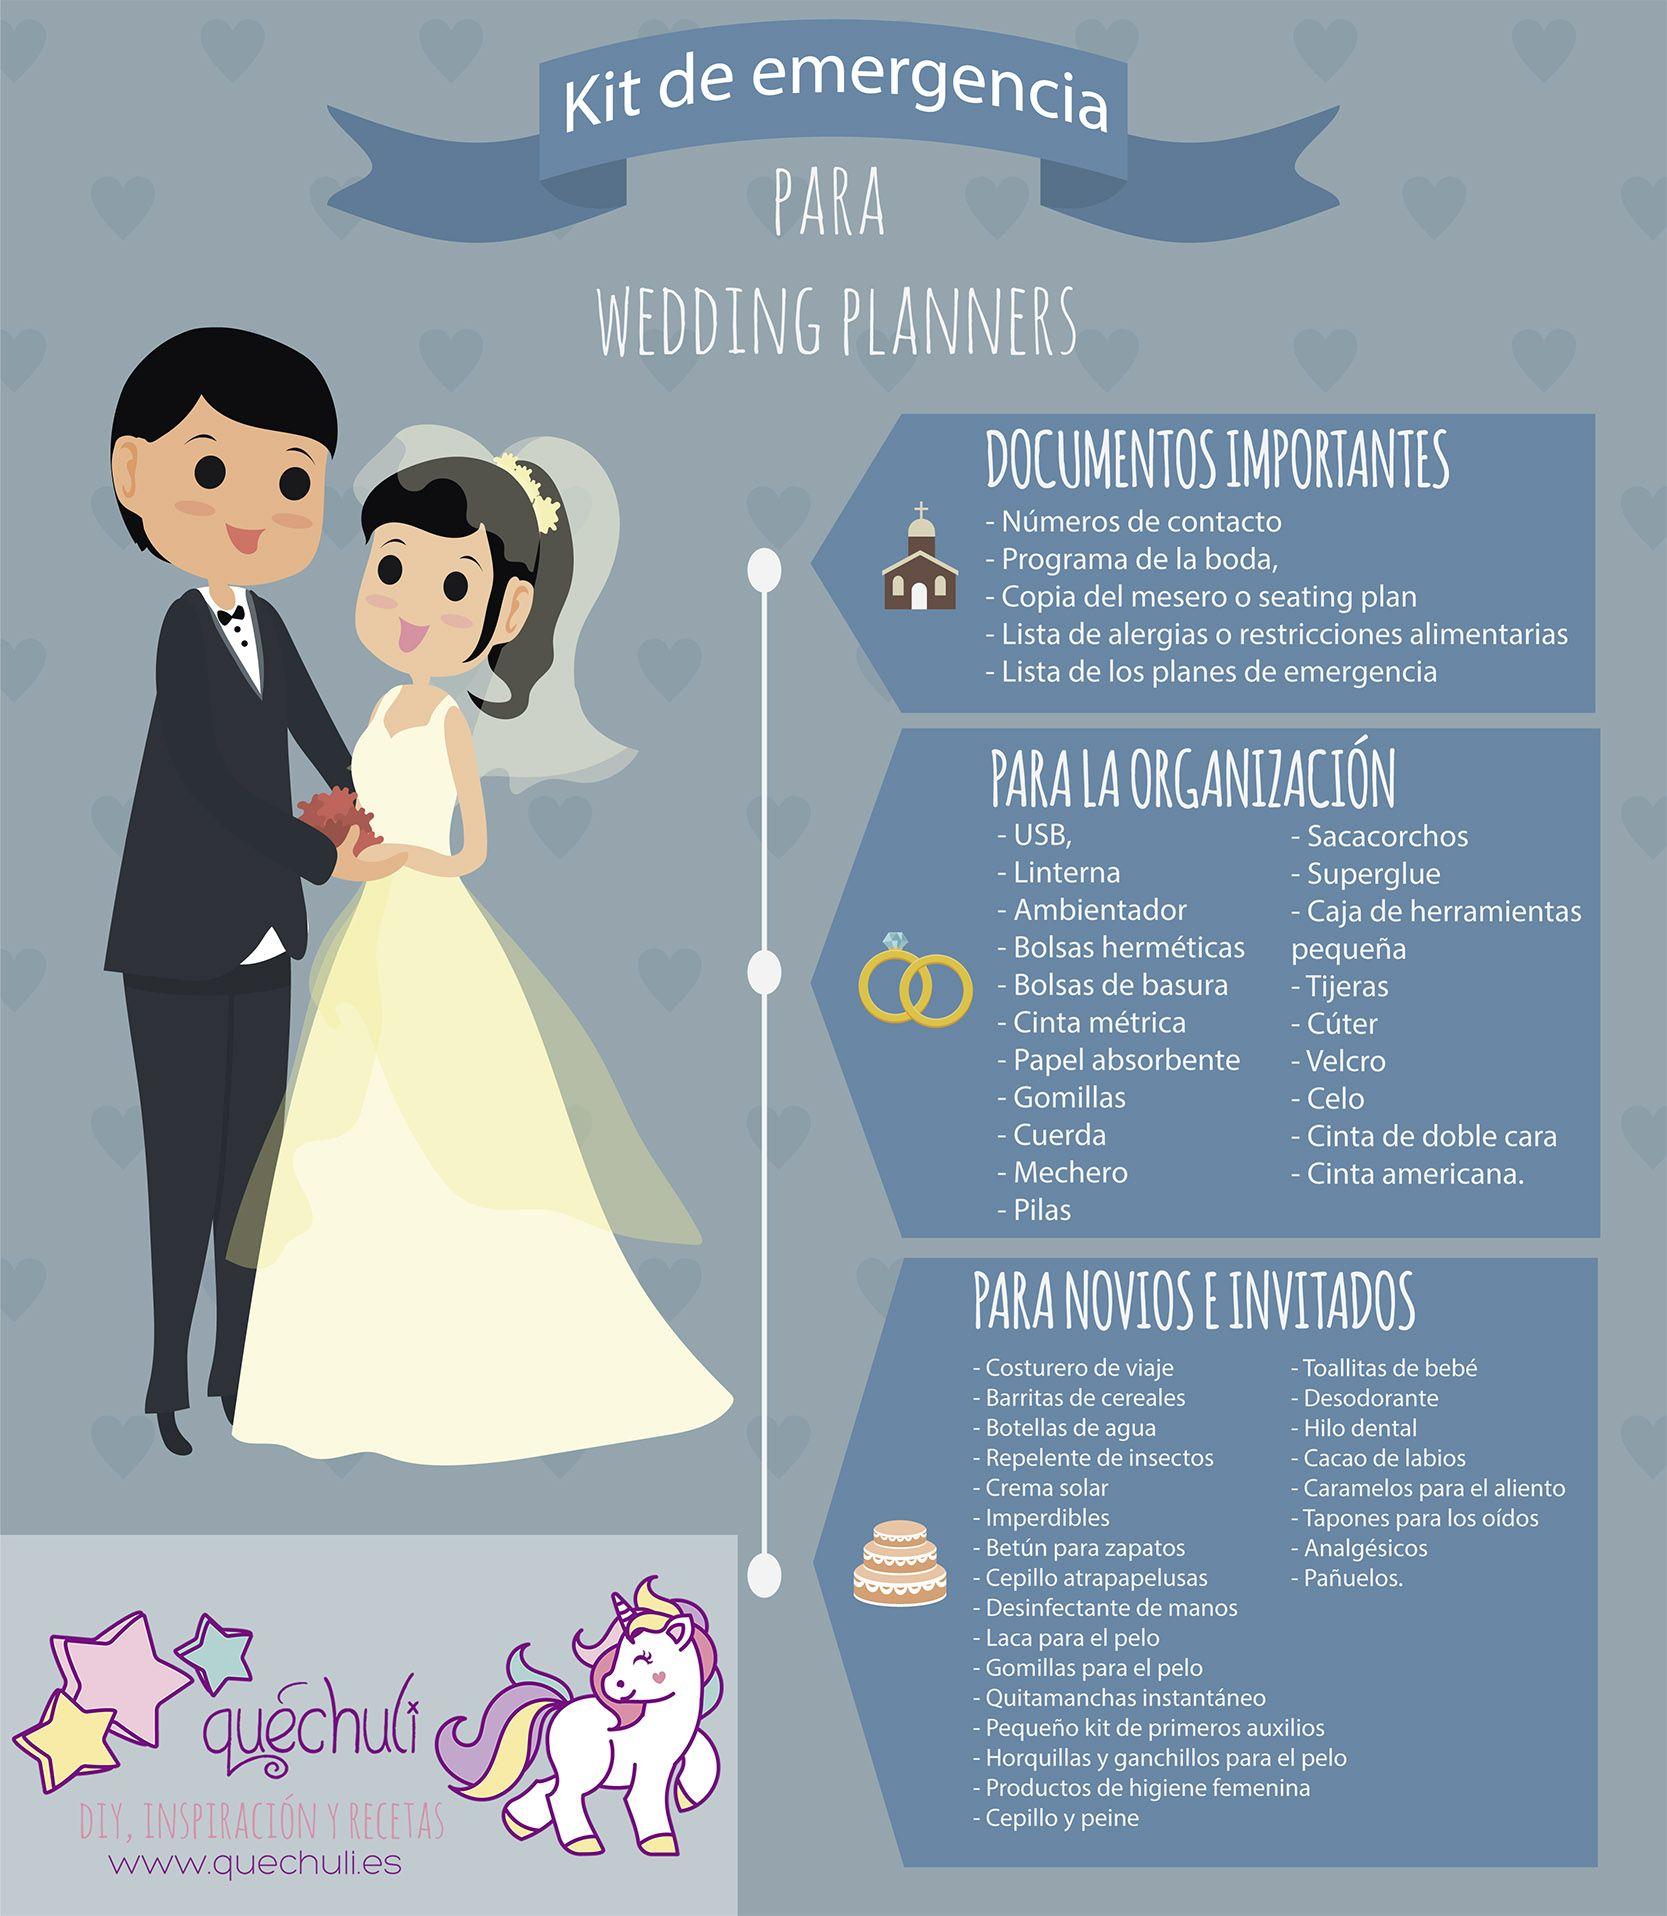 Infografía: kit de emergencia para wedding planners. Todo lo que se ...